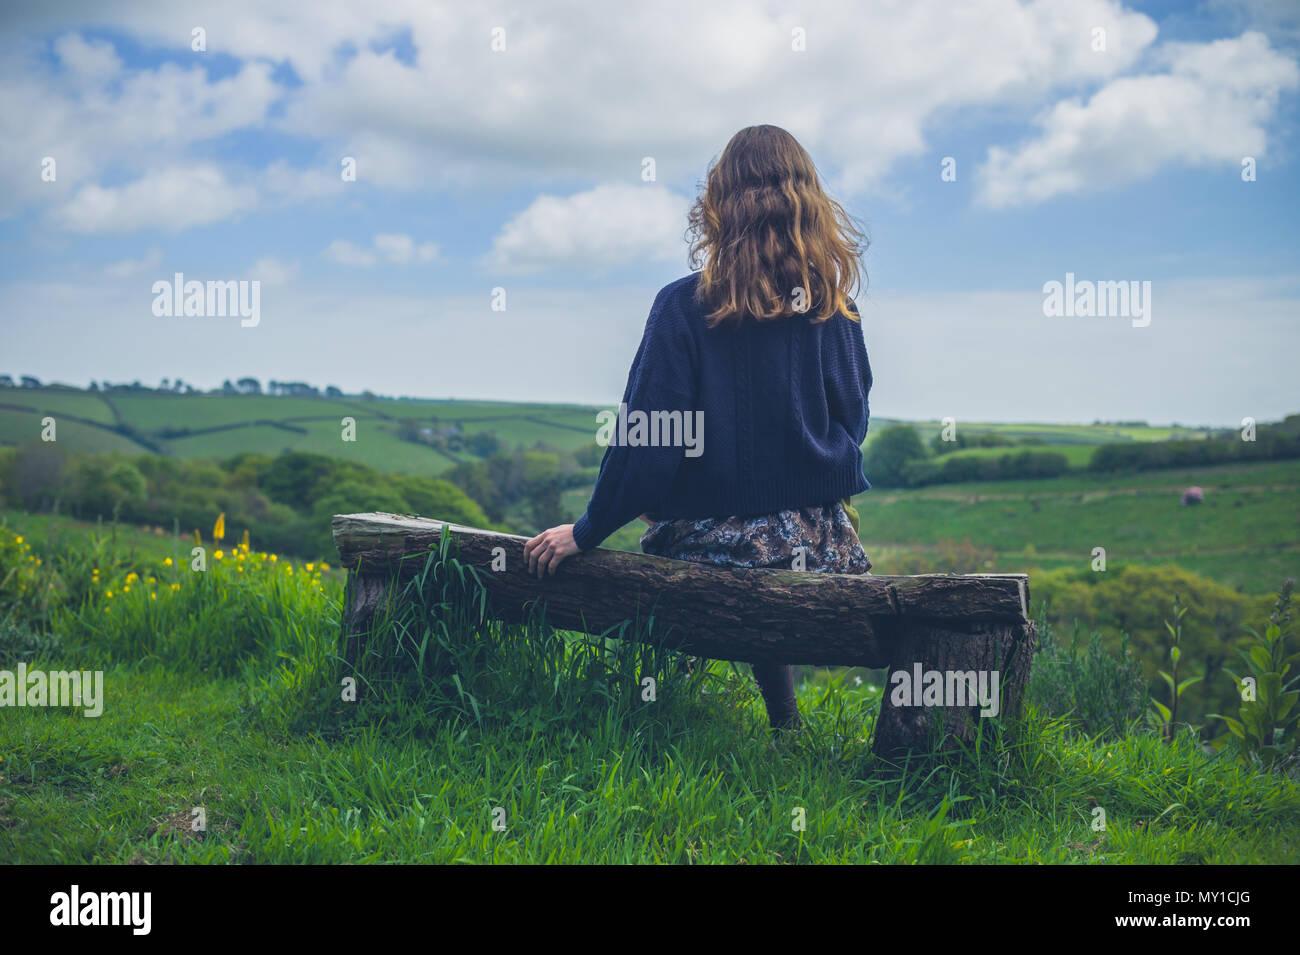 Una giovane donna è seduta su una panchina in campagna Foto Stock